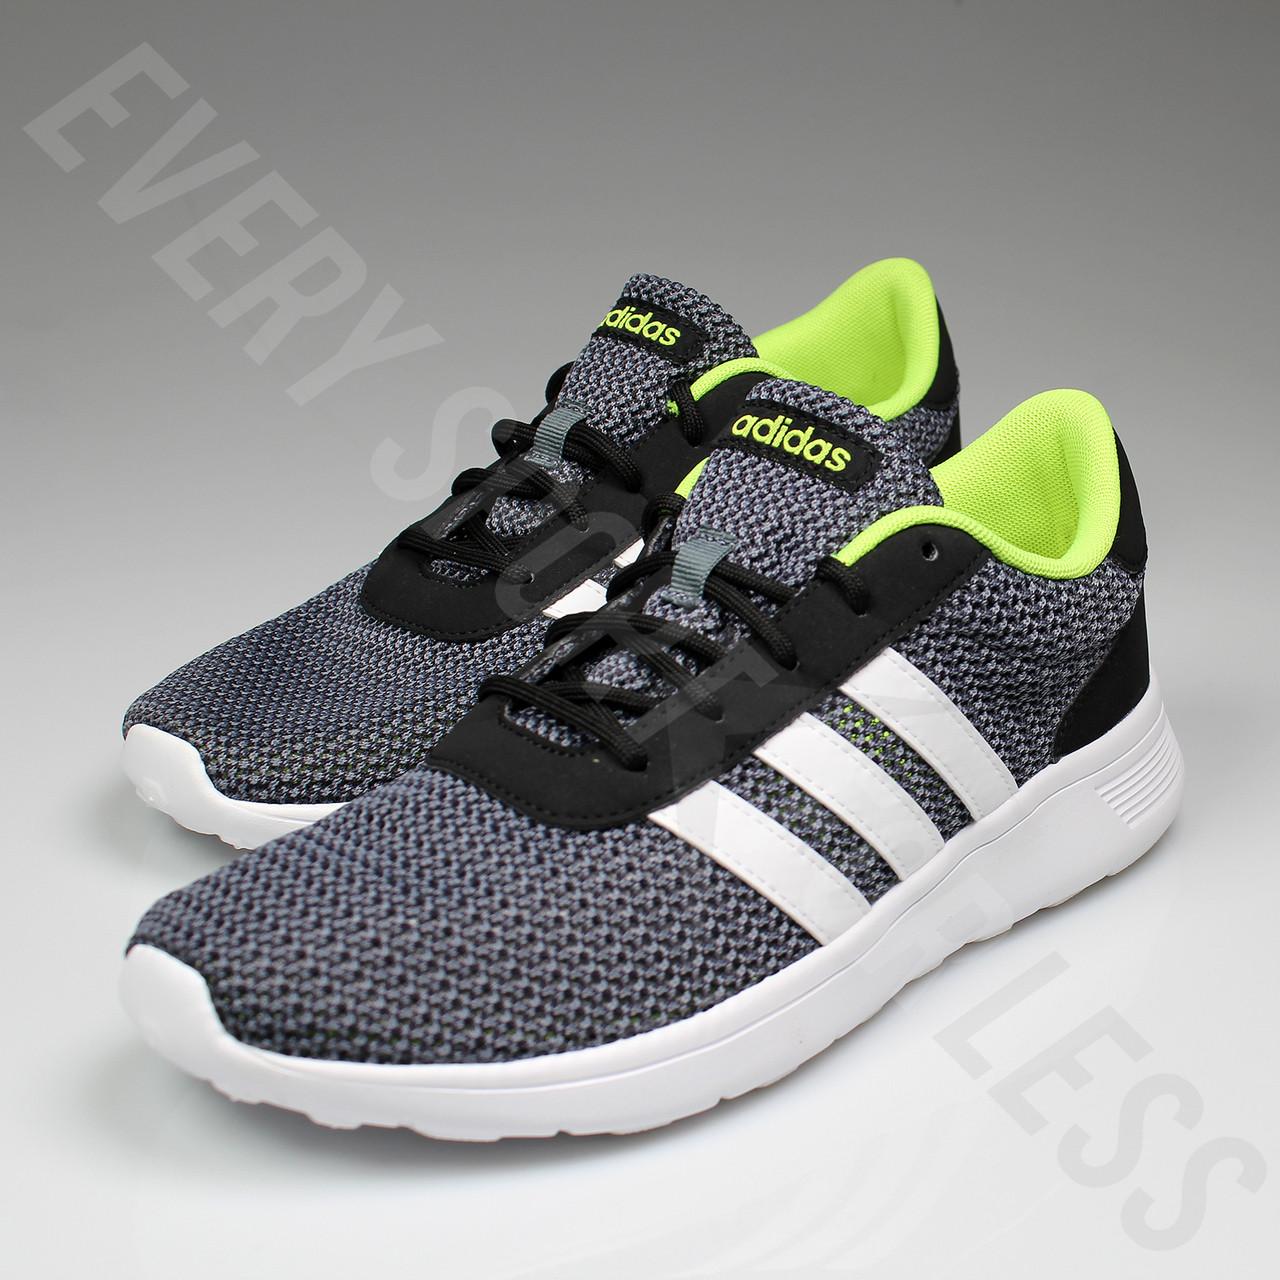 Adidas Neo Lit Racer Mens Running Shoes F99417 - Black, White